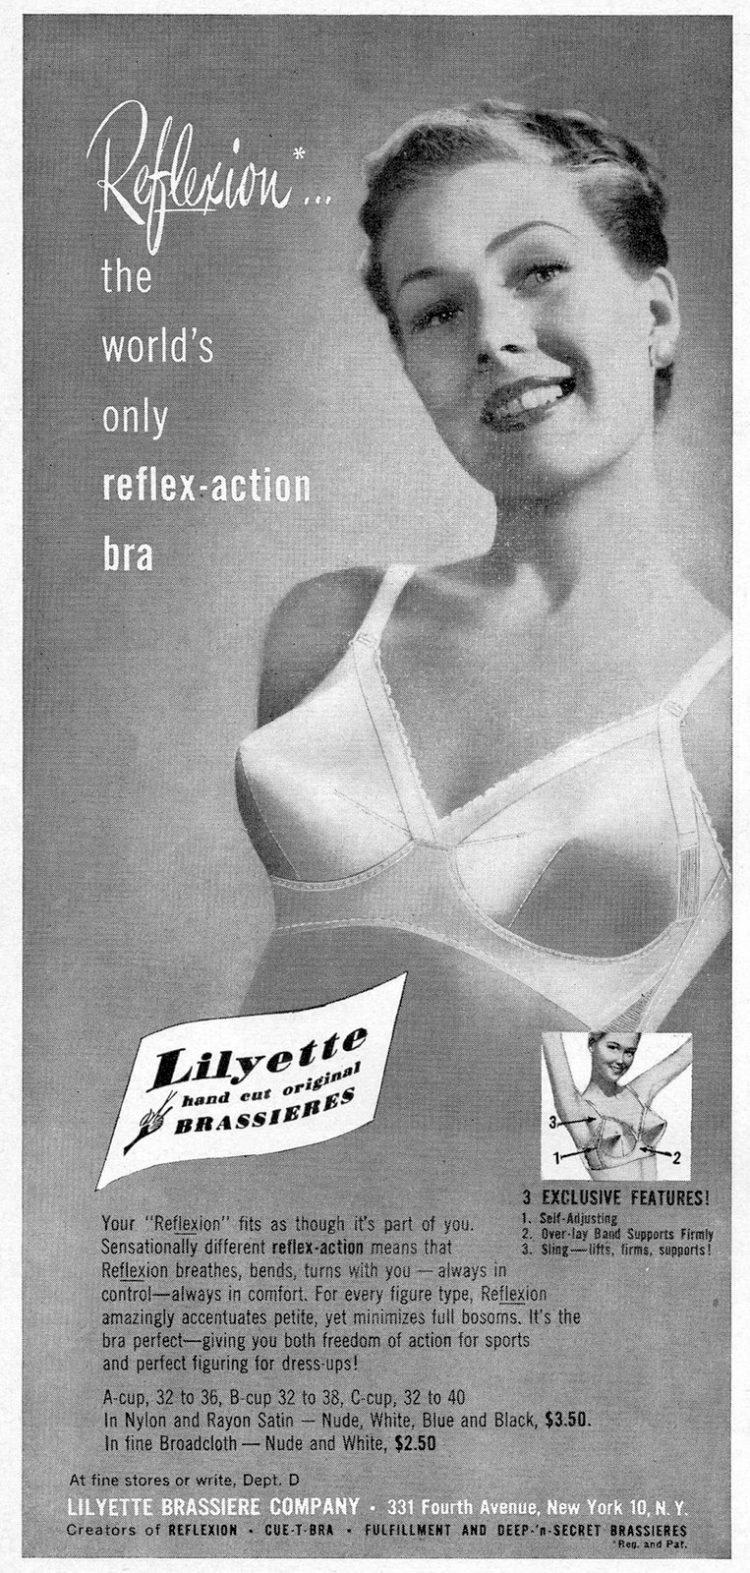 Lilyette Reflexion bra from 1950